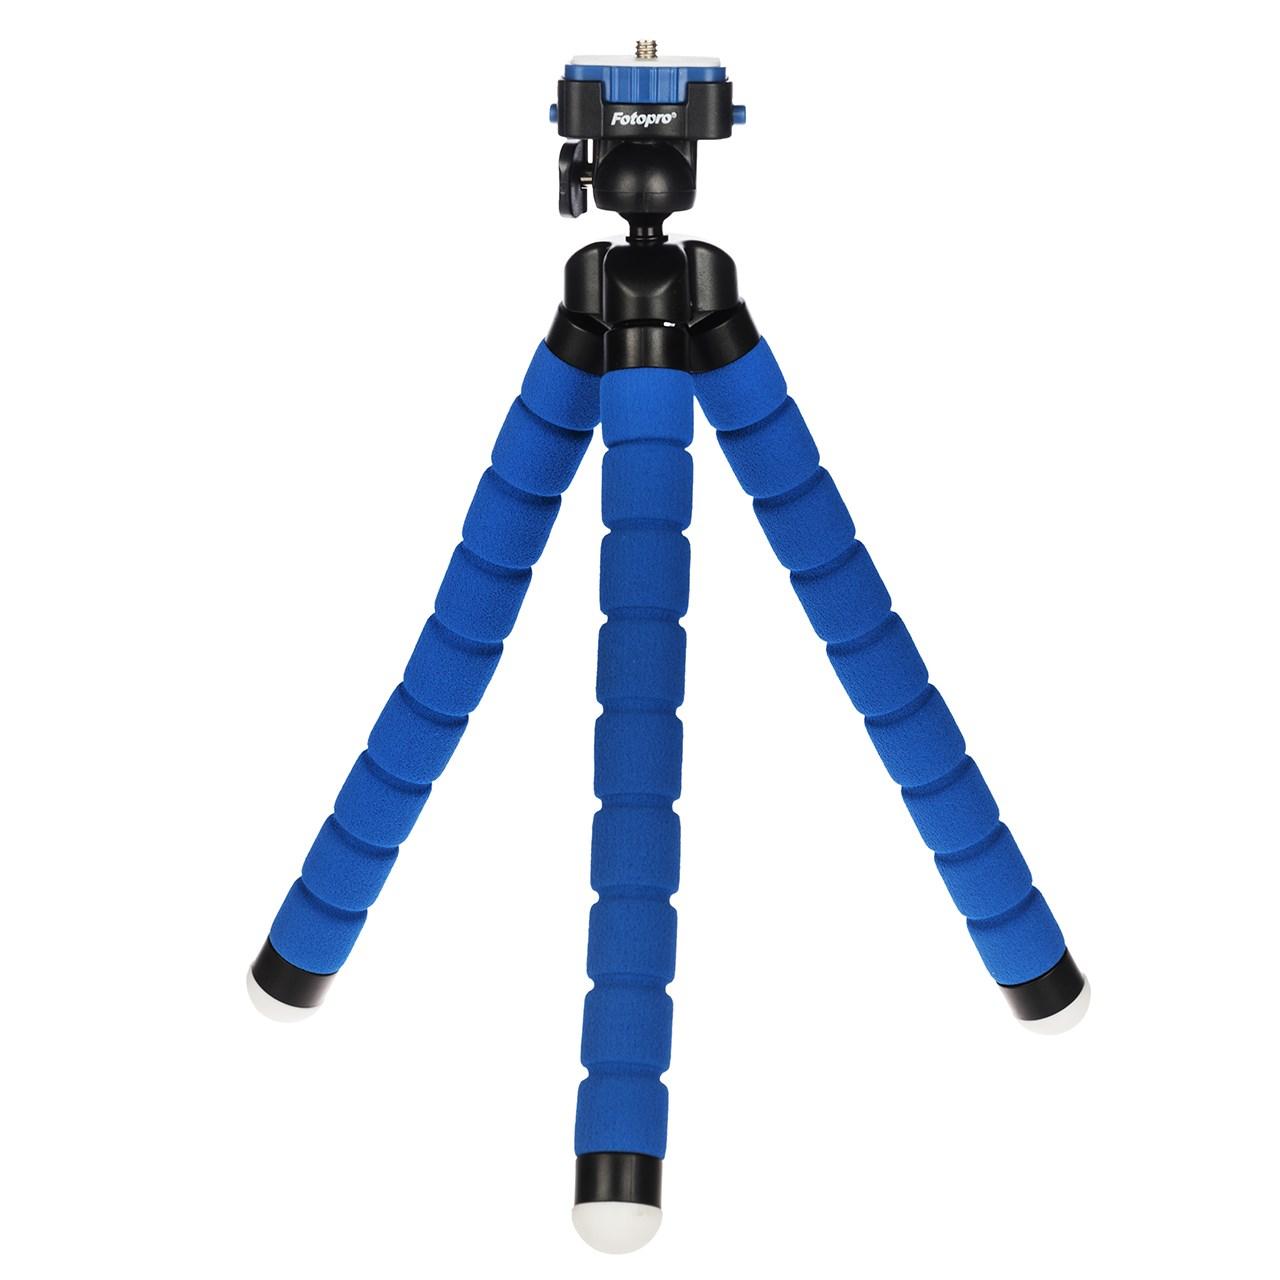 سه پایه دوربین فوتو پرو مدل RM-100-1